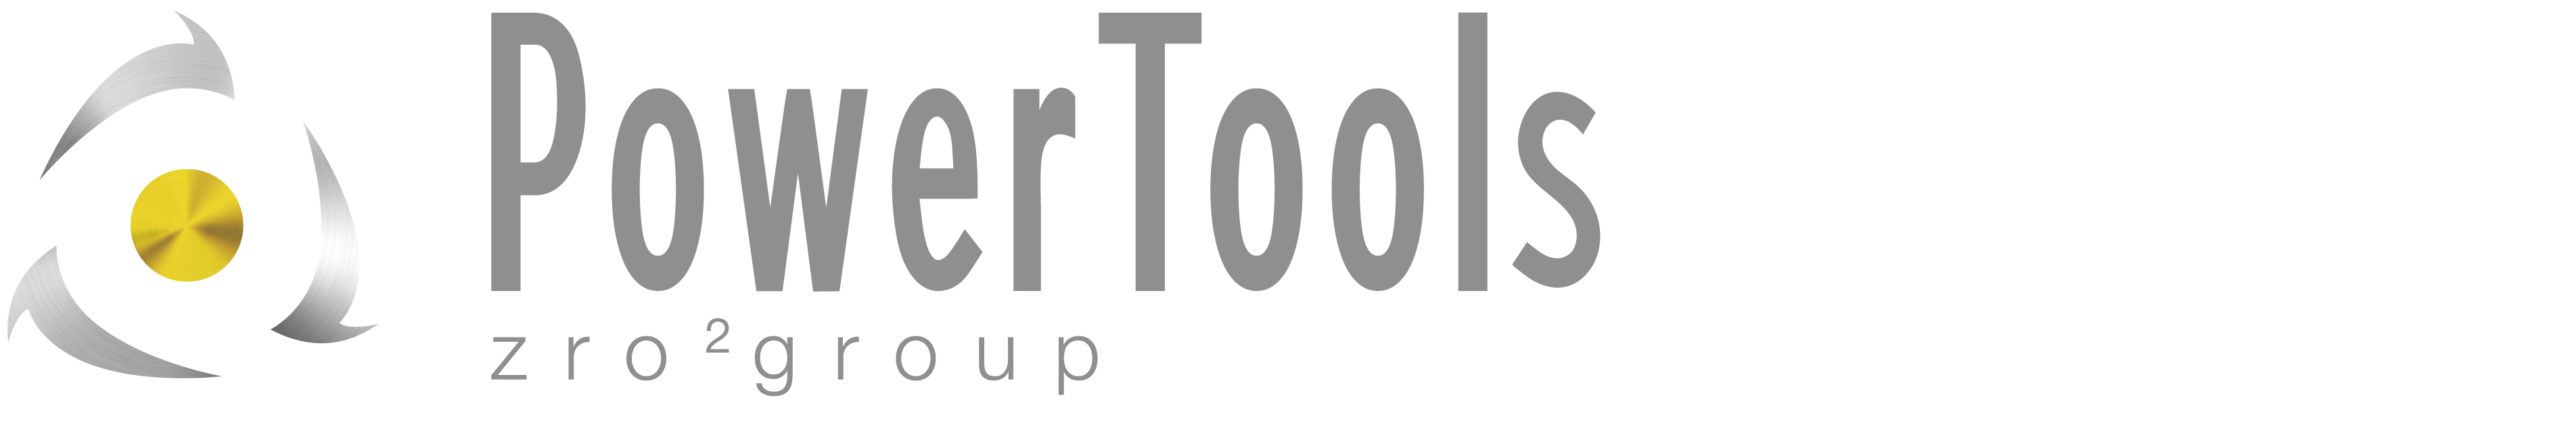 ZrO2-PowerTools